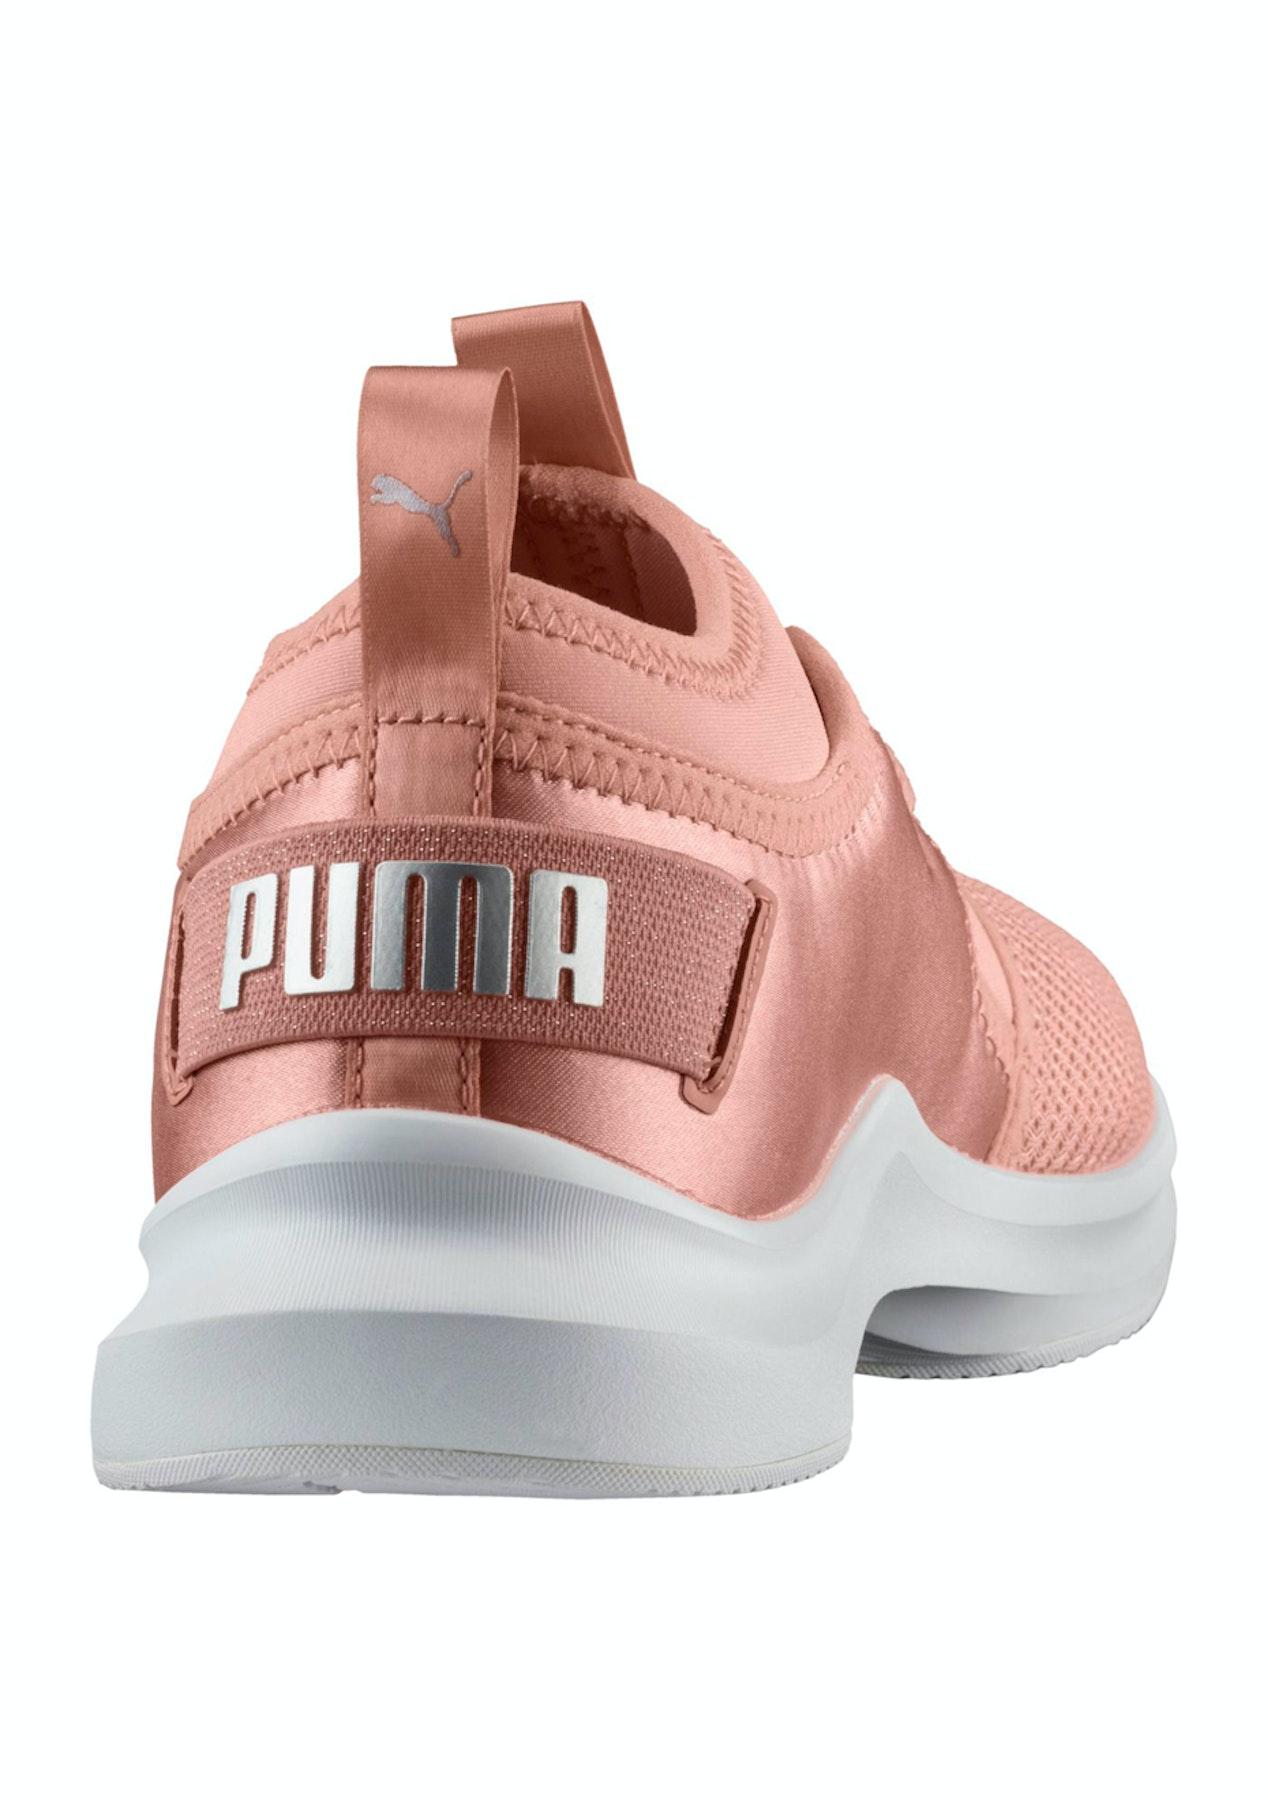 1e0ff7b5a952 Puma Womens - Phenom Low Satin Ep - Peach - Puma Womens   Kids up to 63% Off  - Onceit